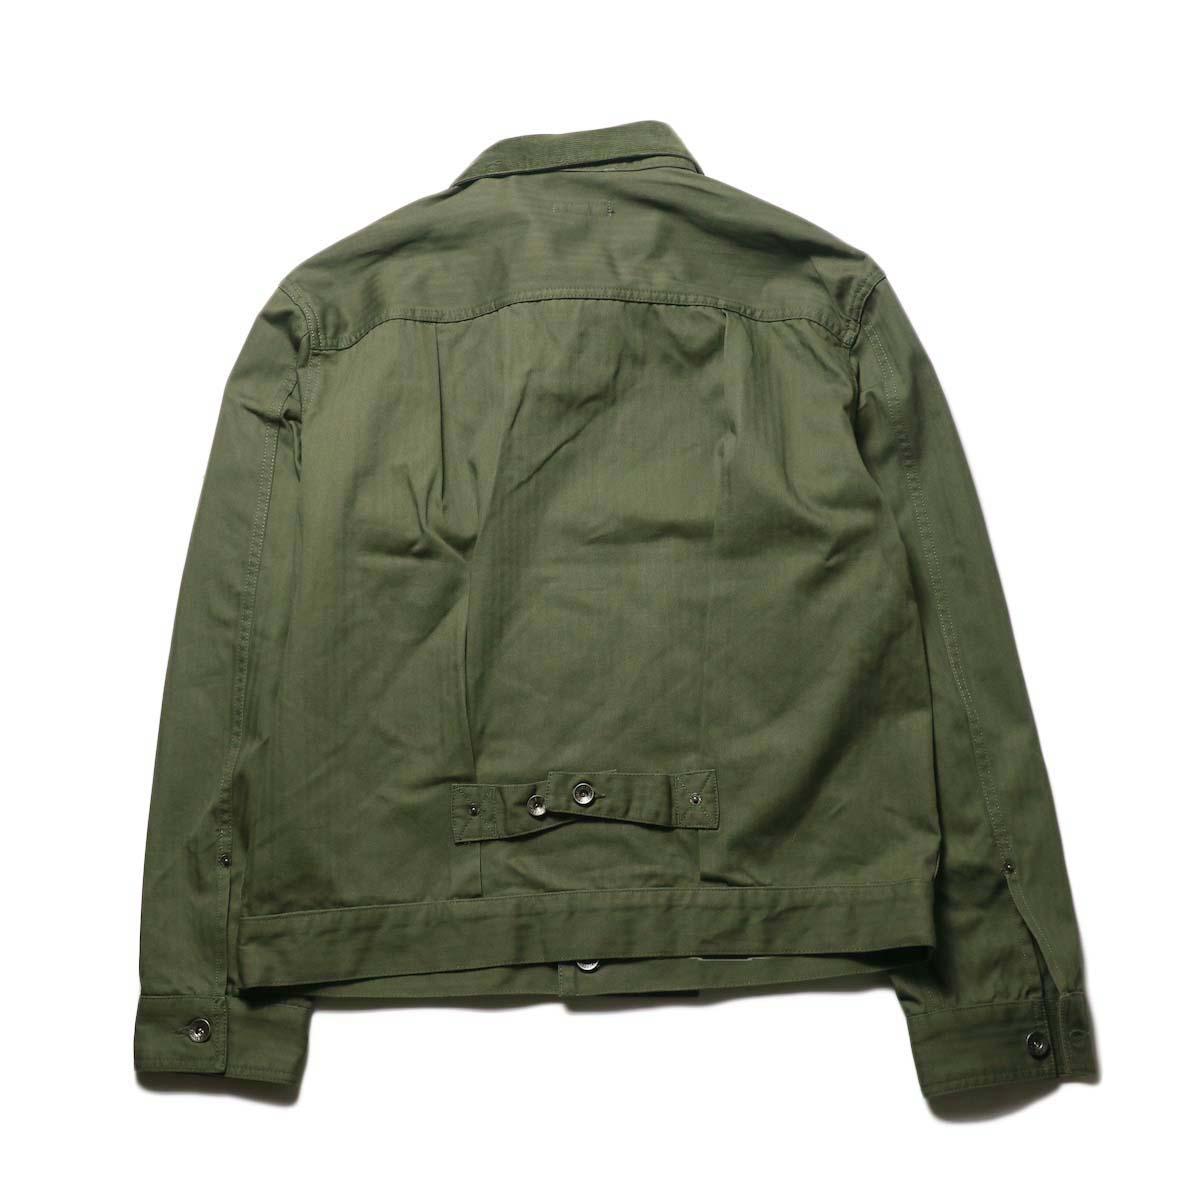 Engineered Garments / Trucker Jacket -Hb Twill (Olive)背面